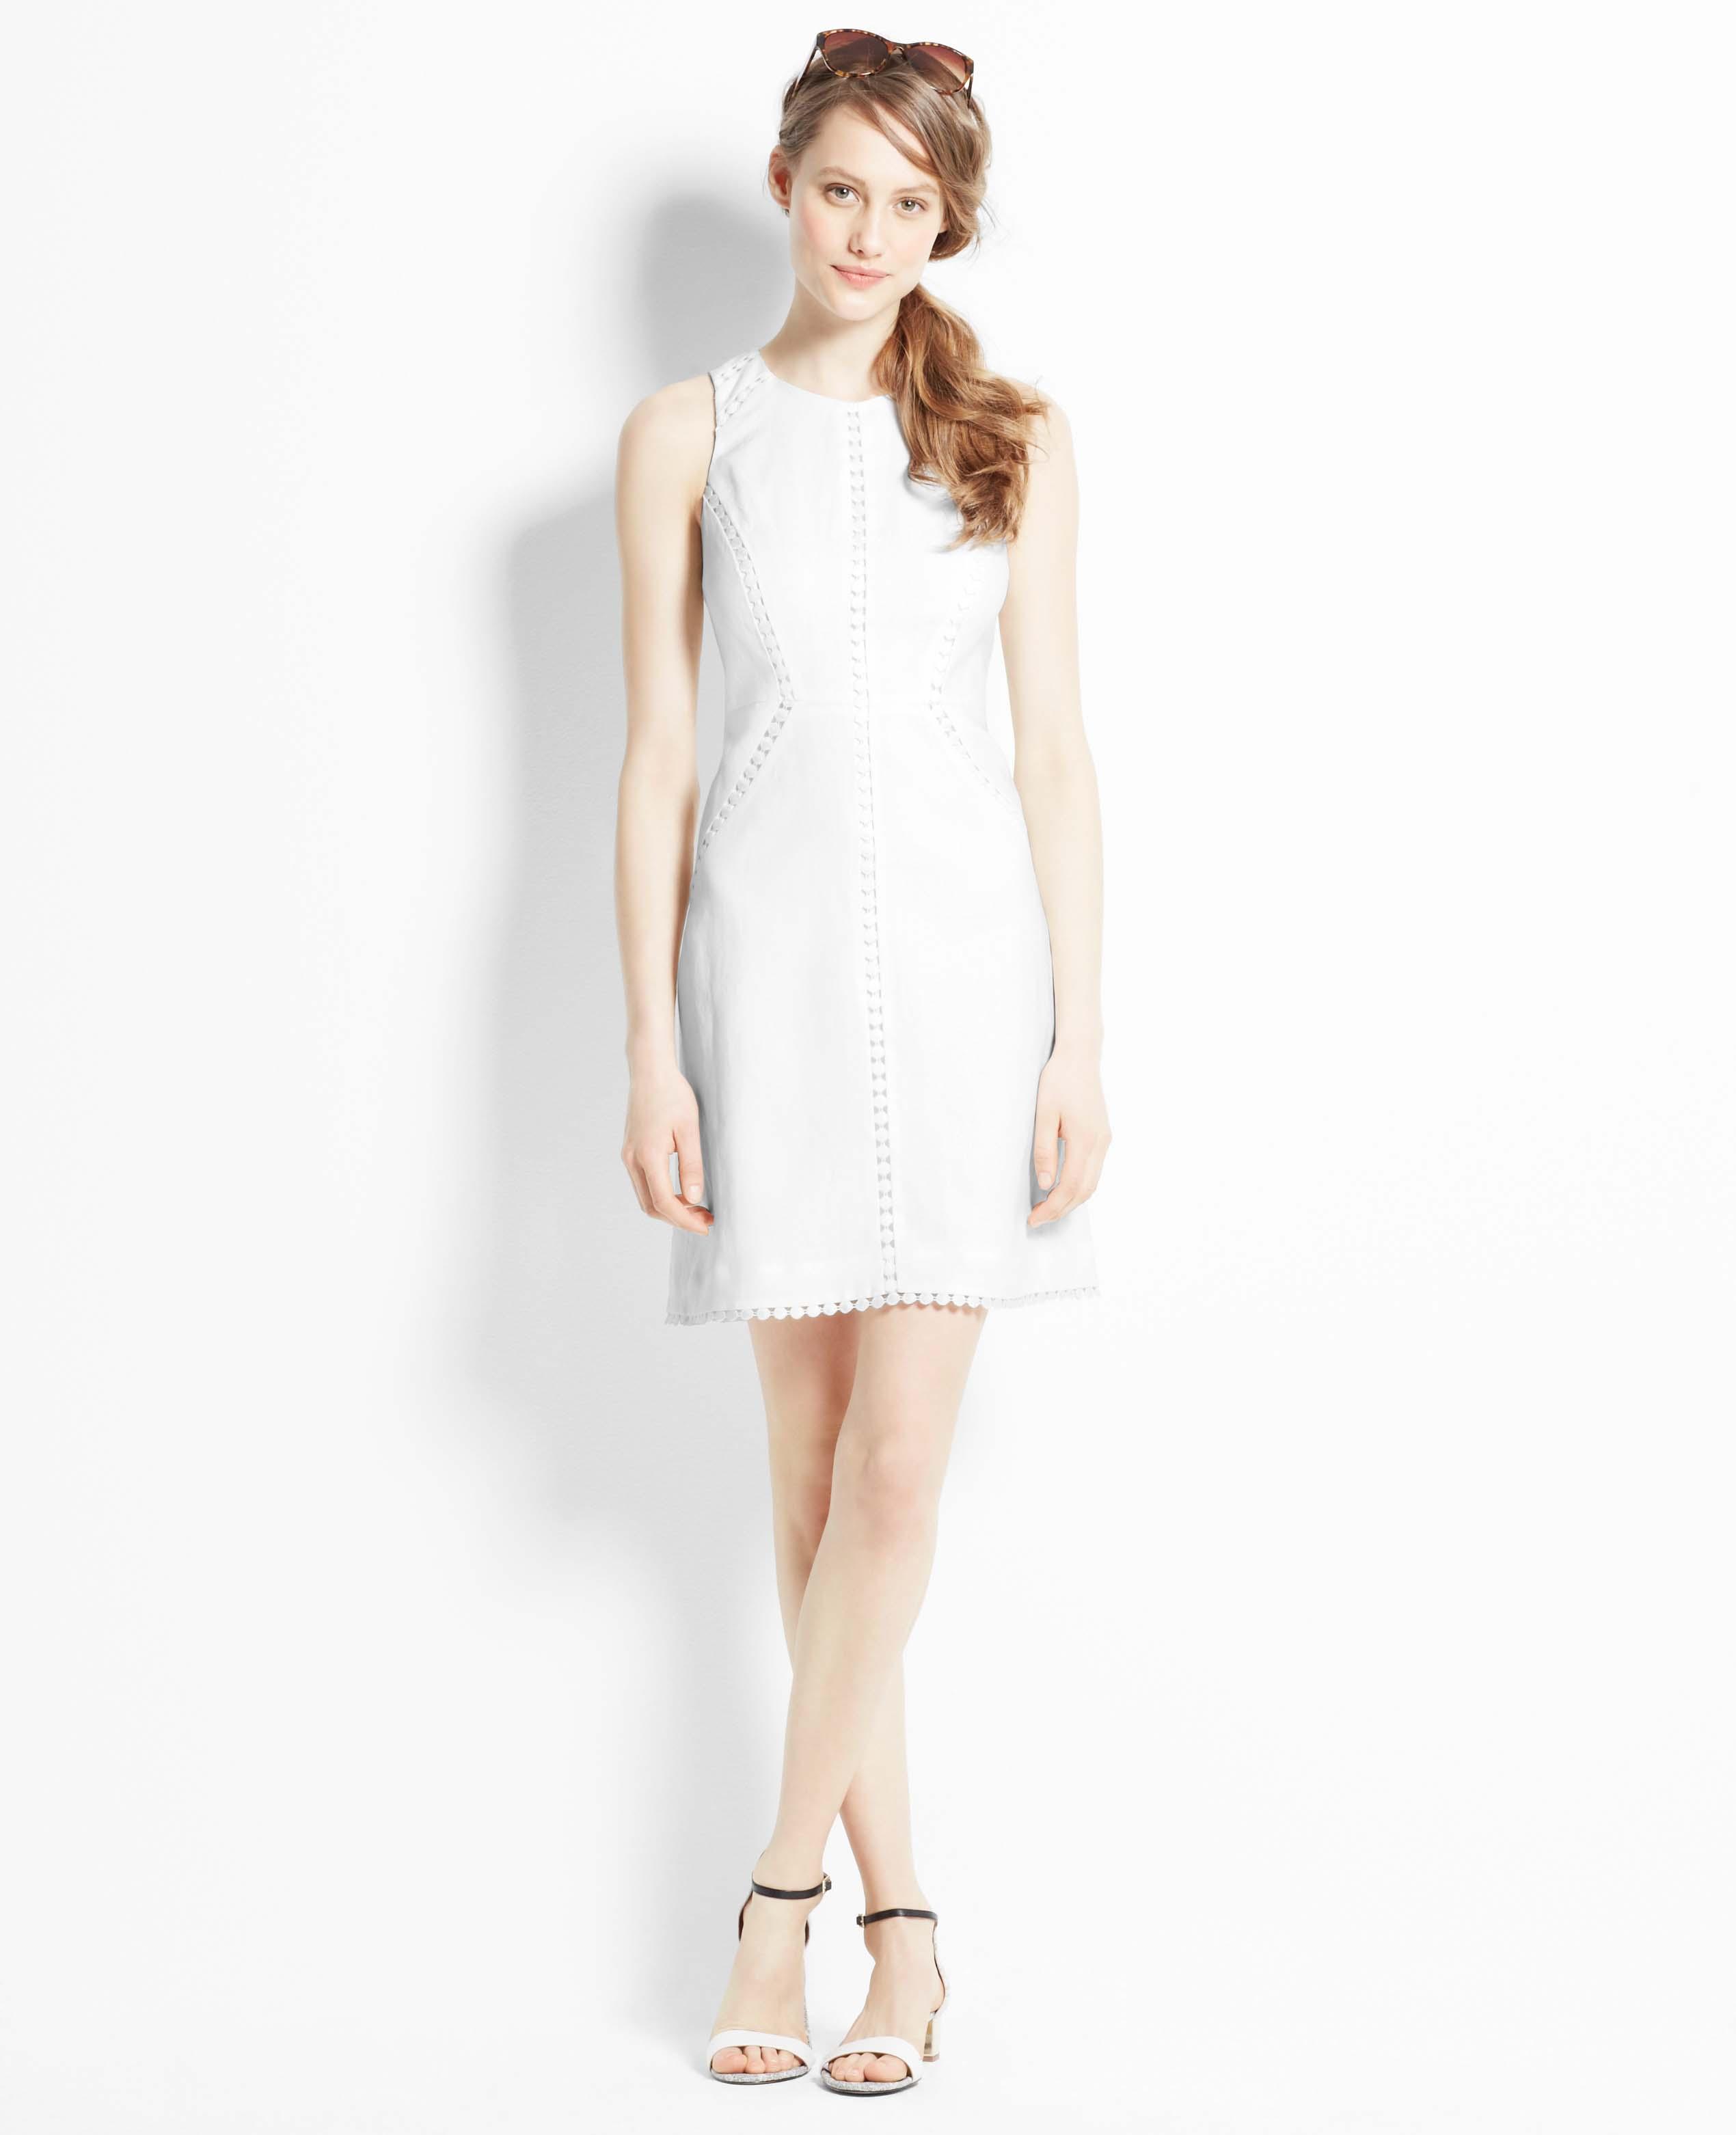 c8053ebfa36 ... style kate hudson ann taylor white dress asymmetrical trend rose gold  accents cactus los angeles gallery. Gallery Women S White Linen Dresses.  Lyst Ann ...